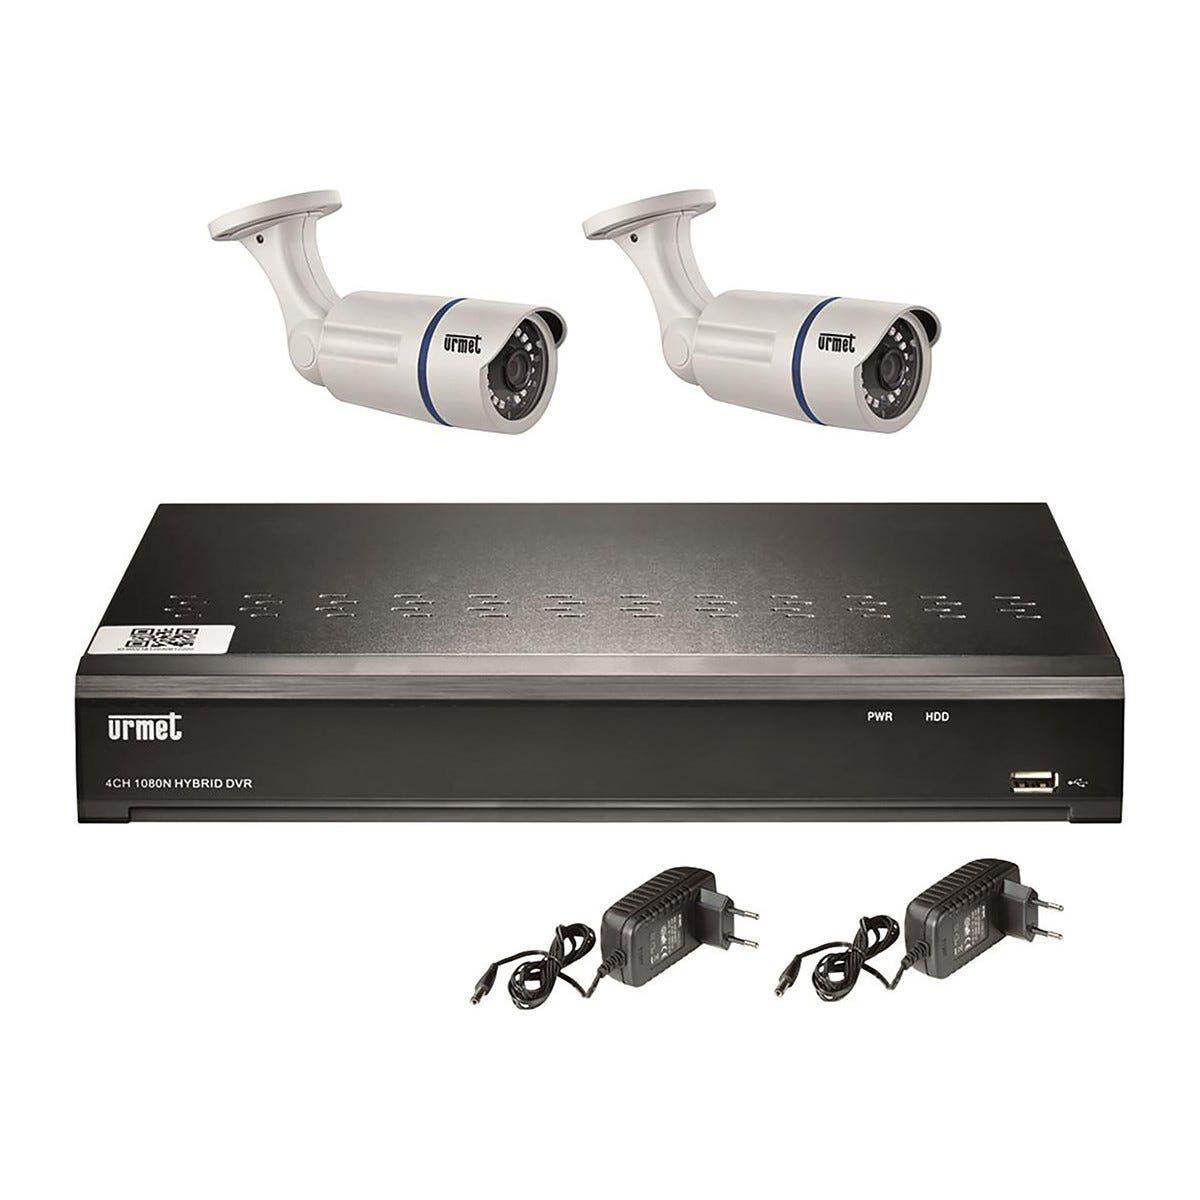 URMET Kit Videosorveglianza  Con 1 Hvr 4 Ch 1080n 2 Telecamere Ahd 1080p 2 Mpx Ottica 3,6 Mm